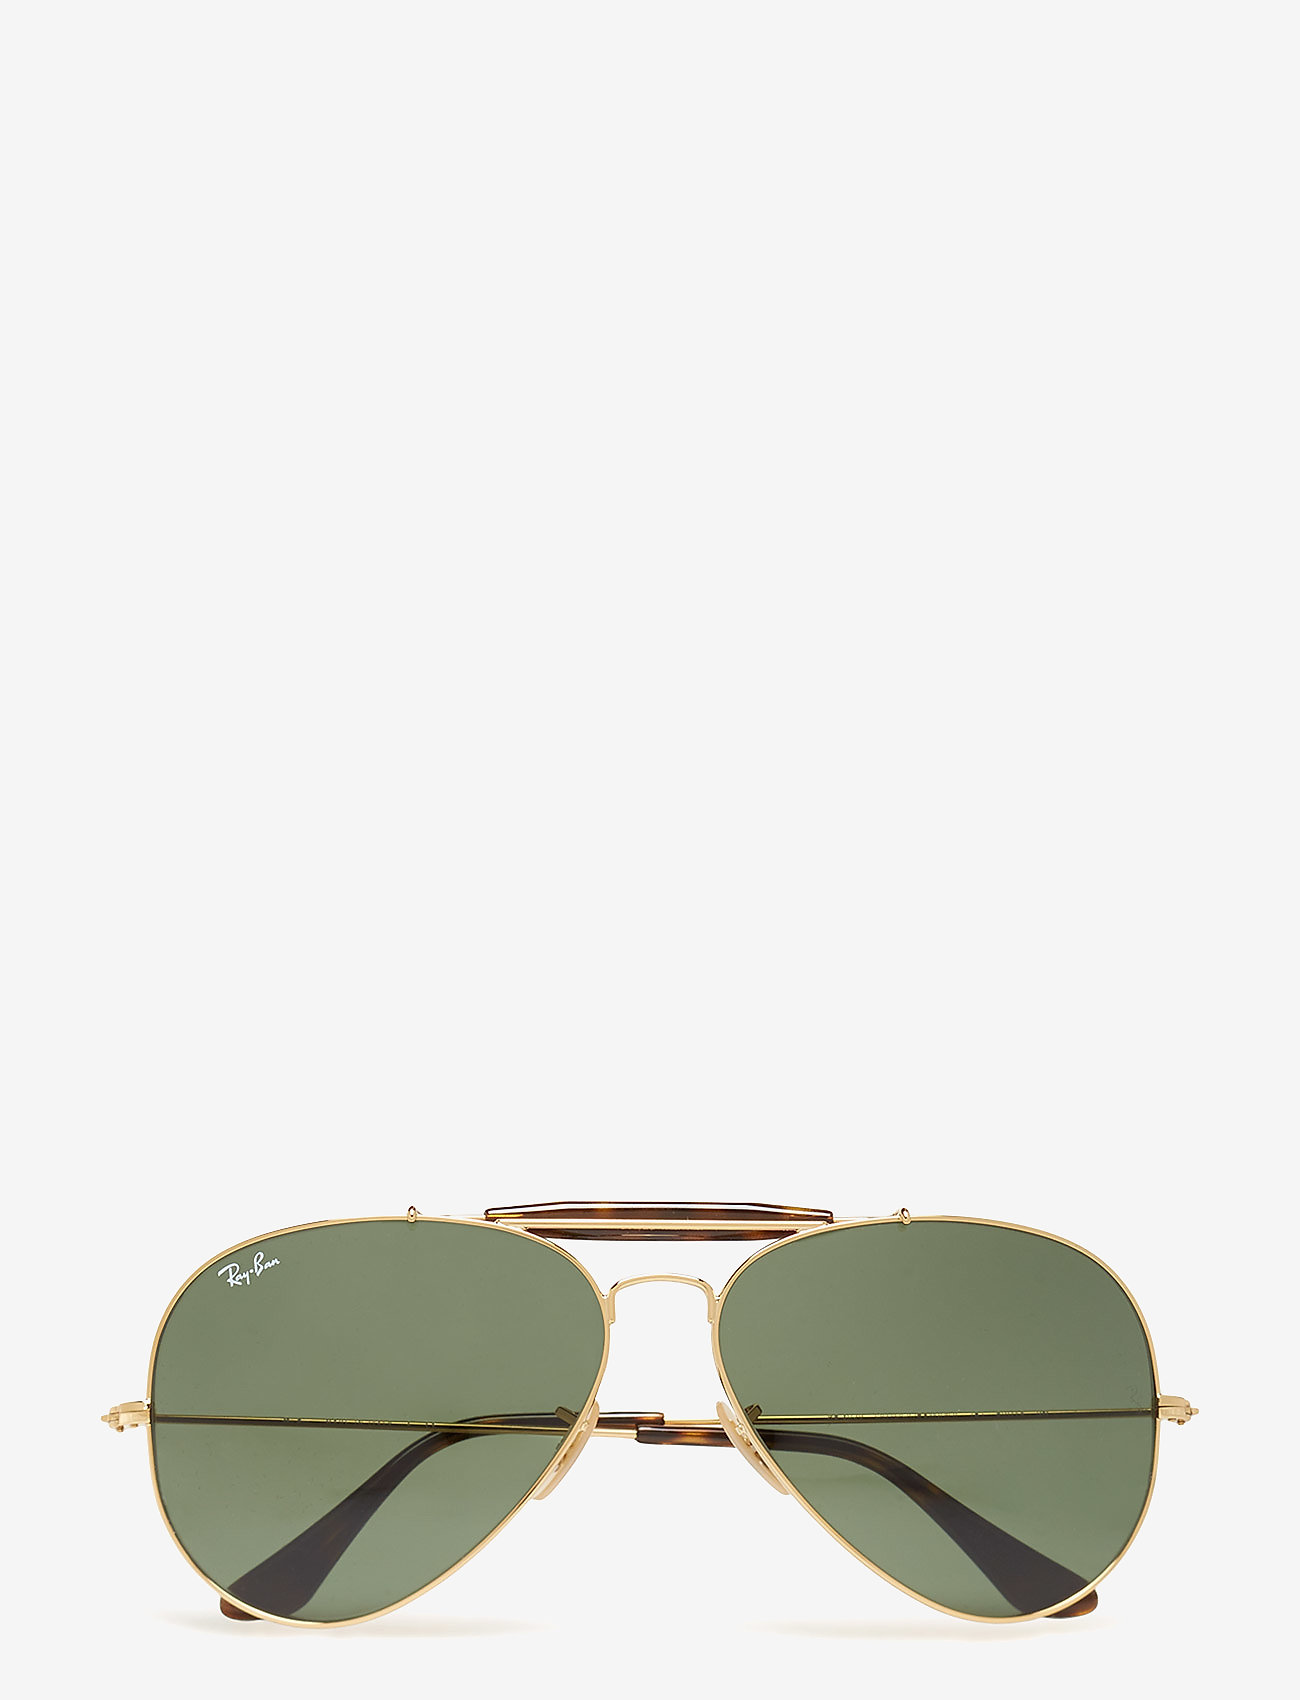 Ray-Ban - OUTDOORSMAN II - piloten zonnebril - gold-dark green - 0